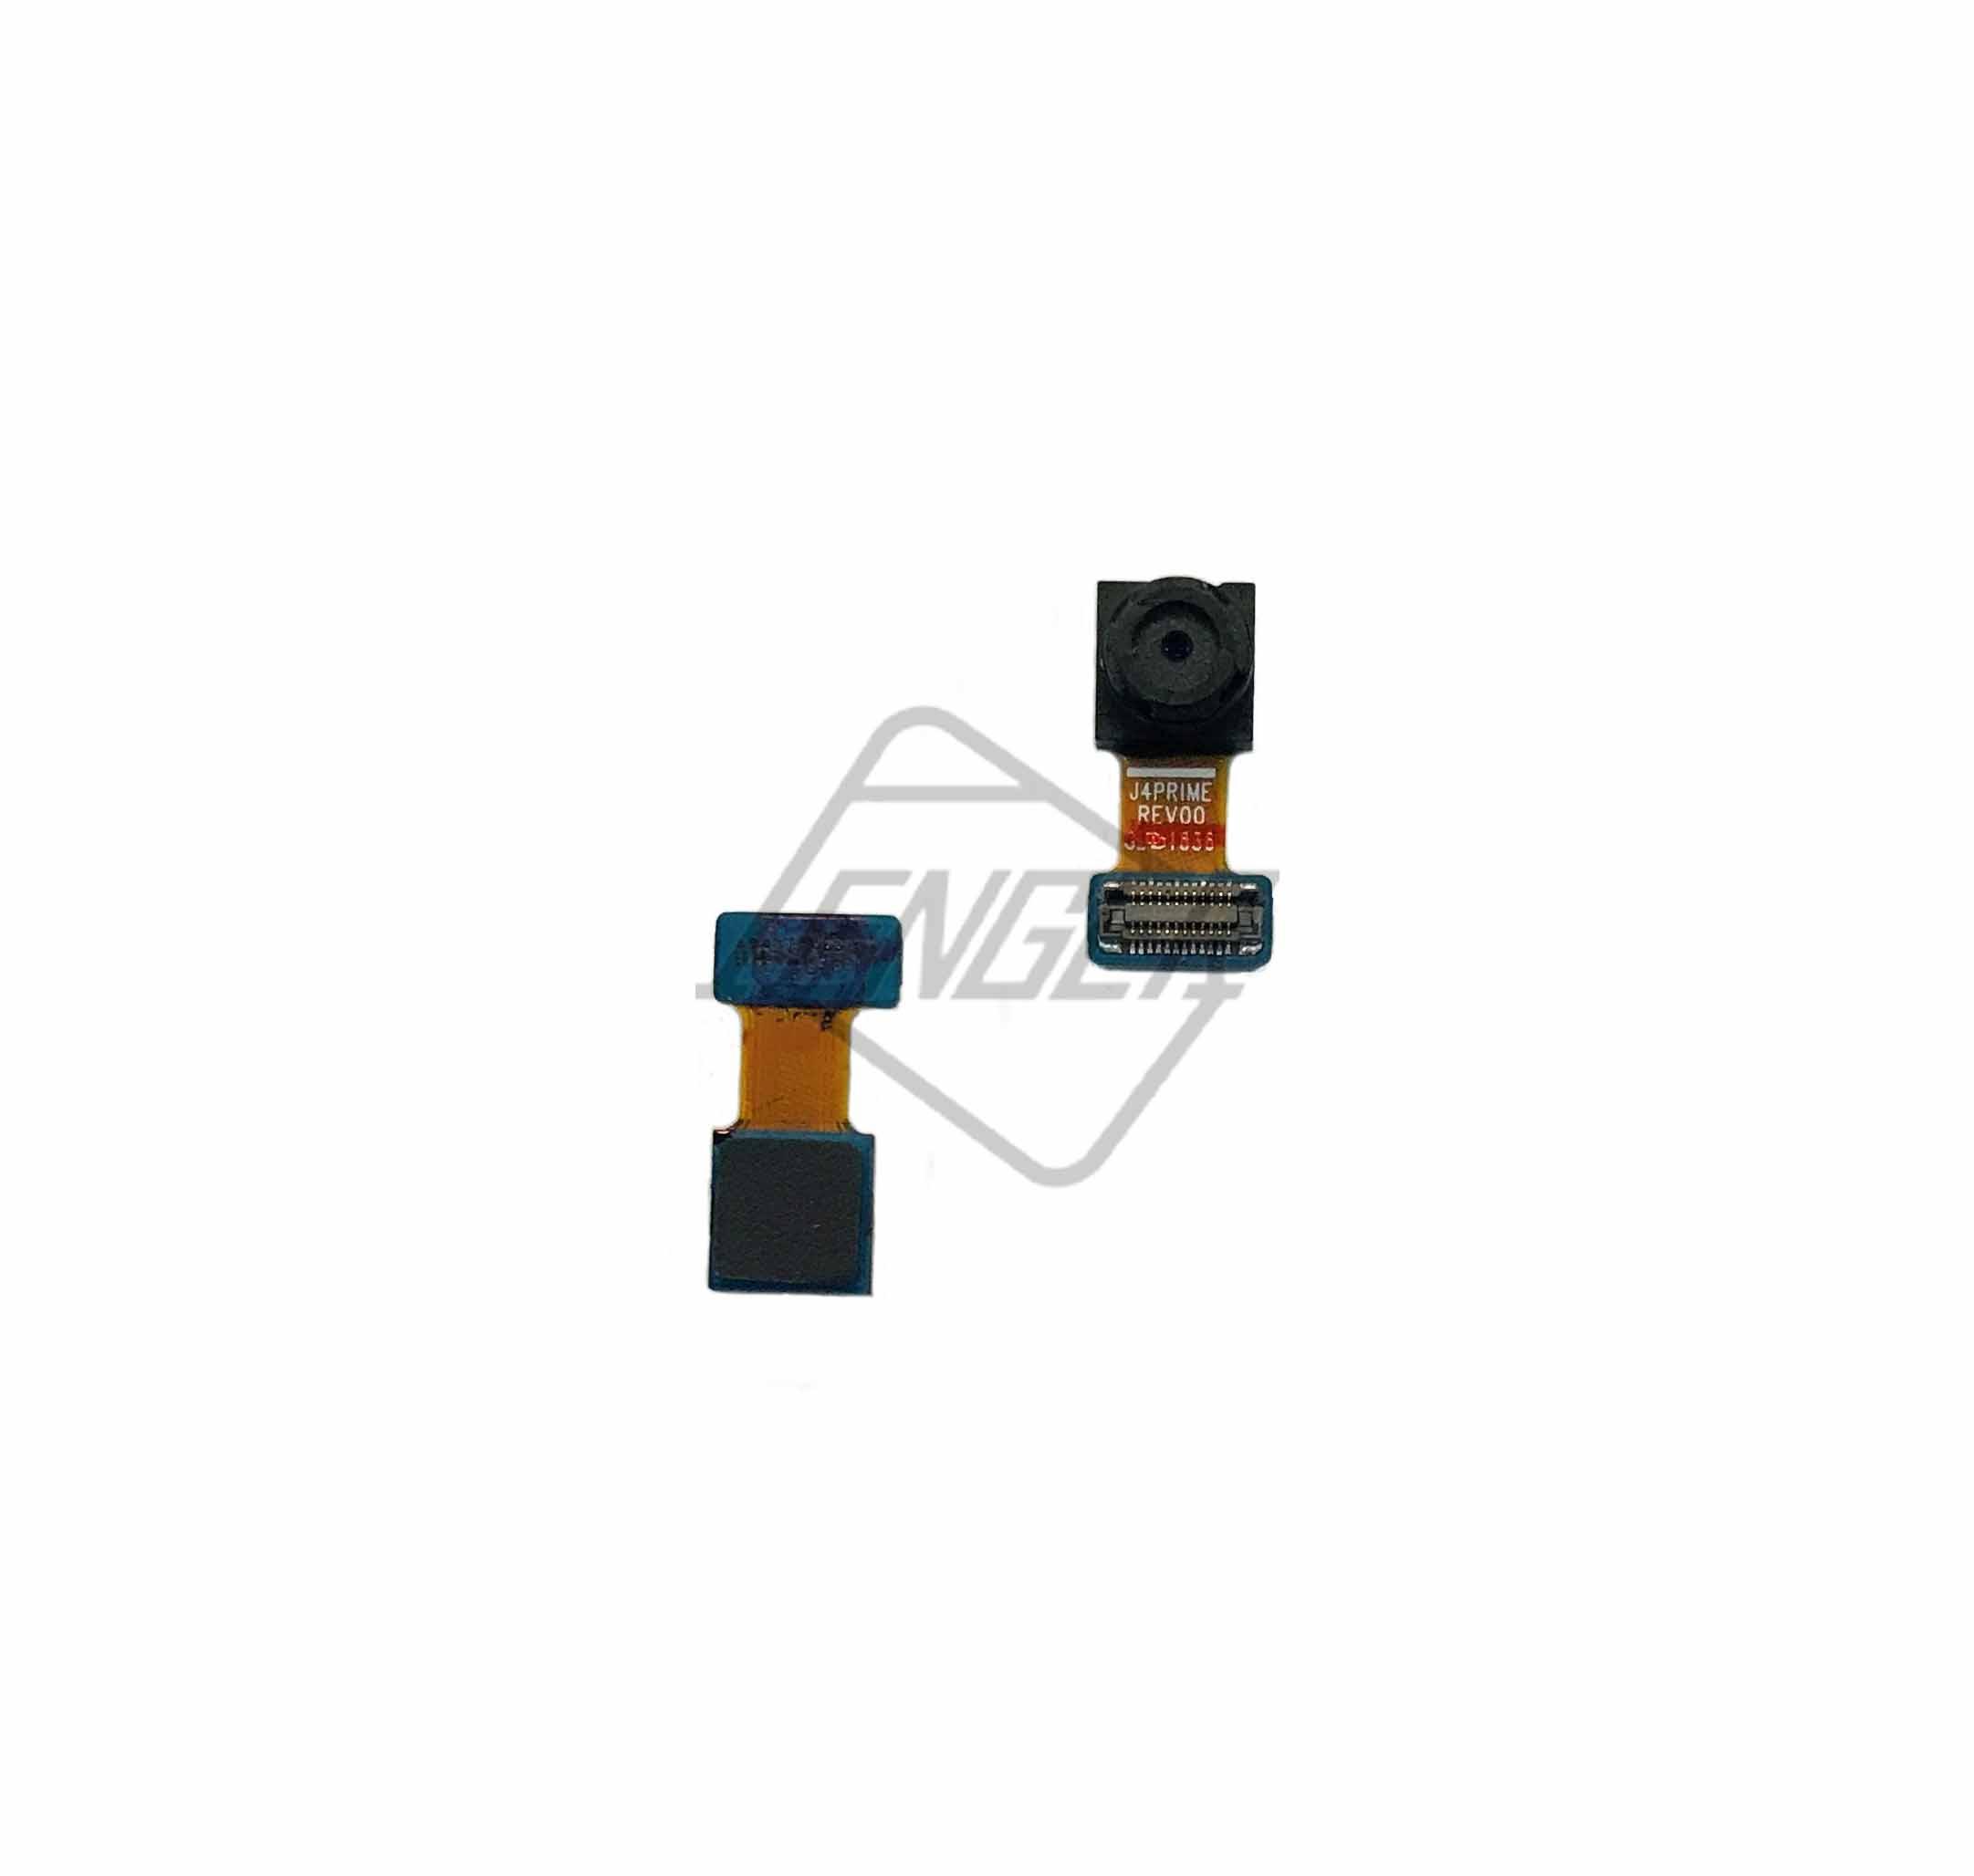 دوربین جلو سامسونگ FRONT CAMERA SAMSUNG J4PLUS